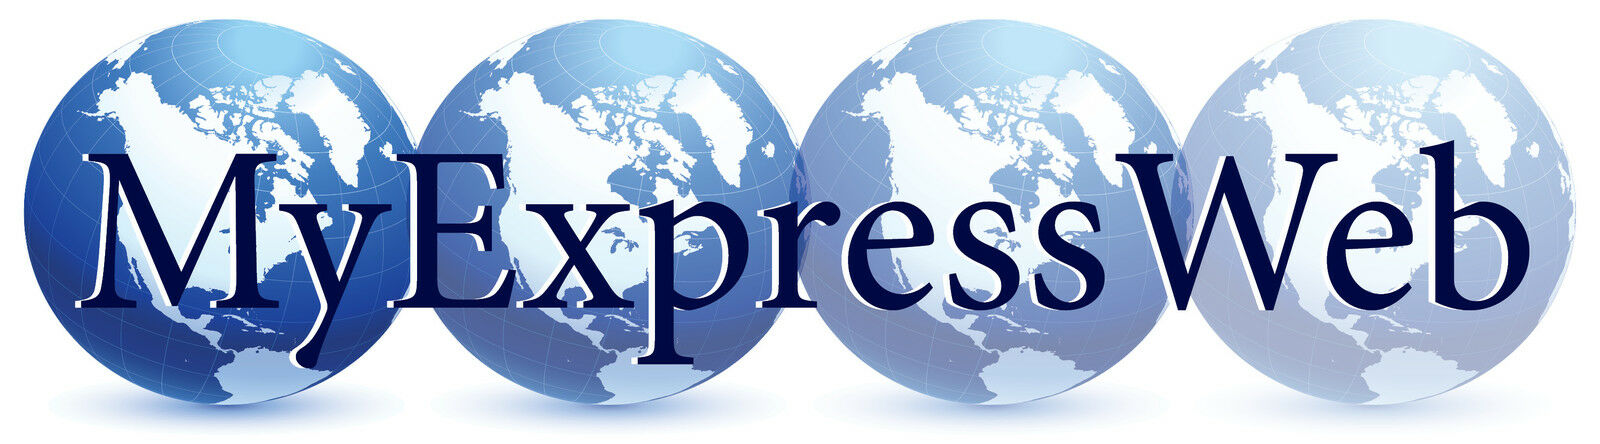 MyExpressWeb